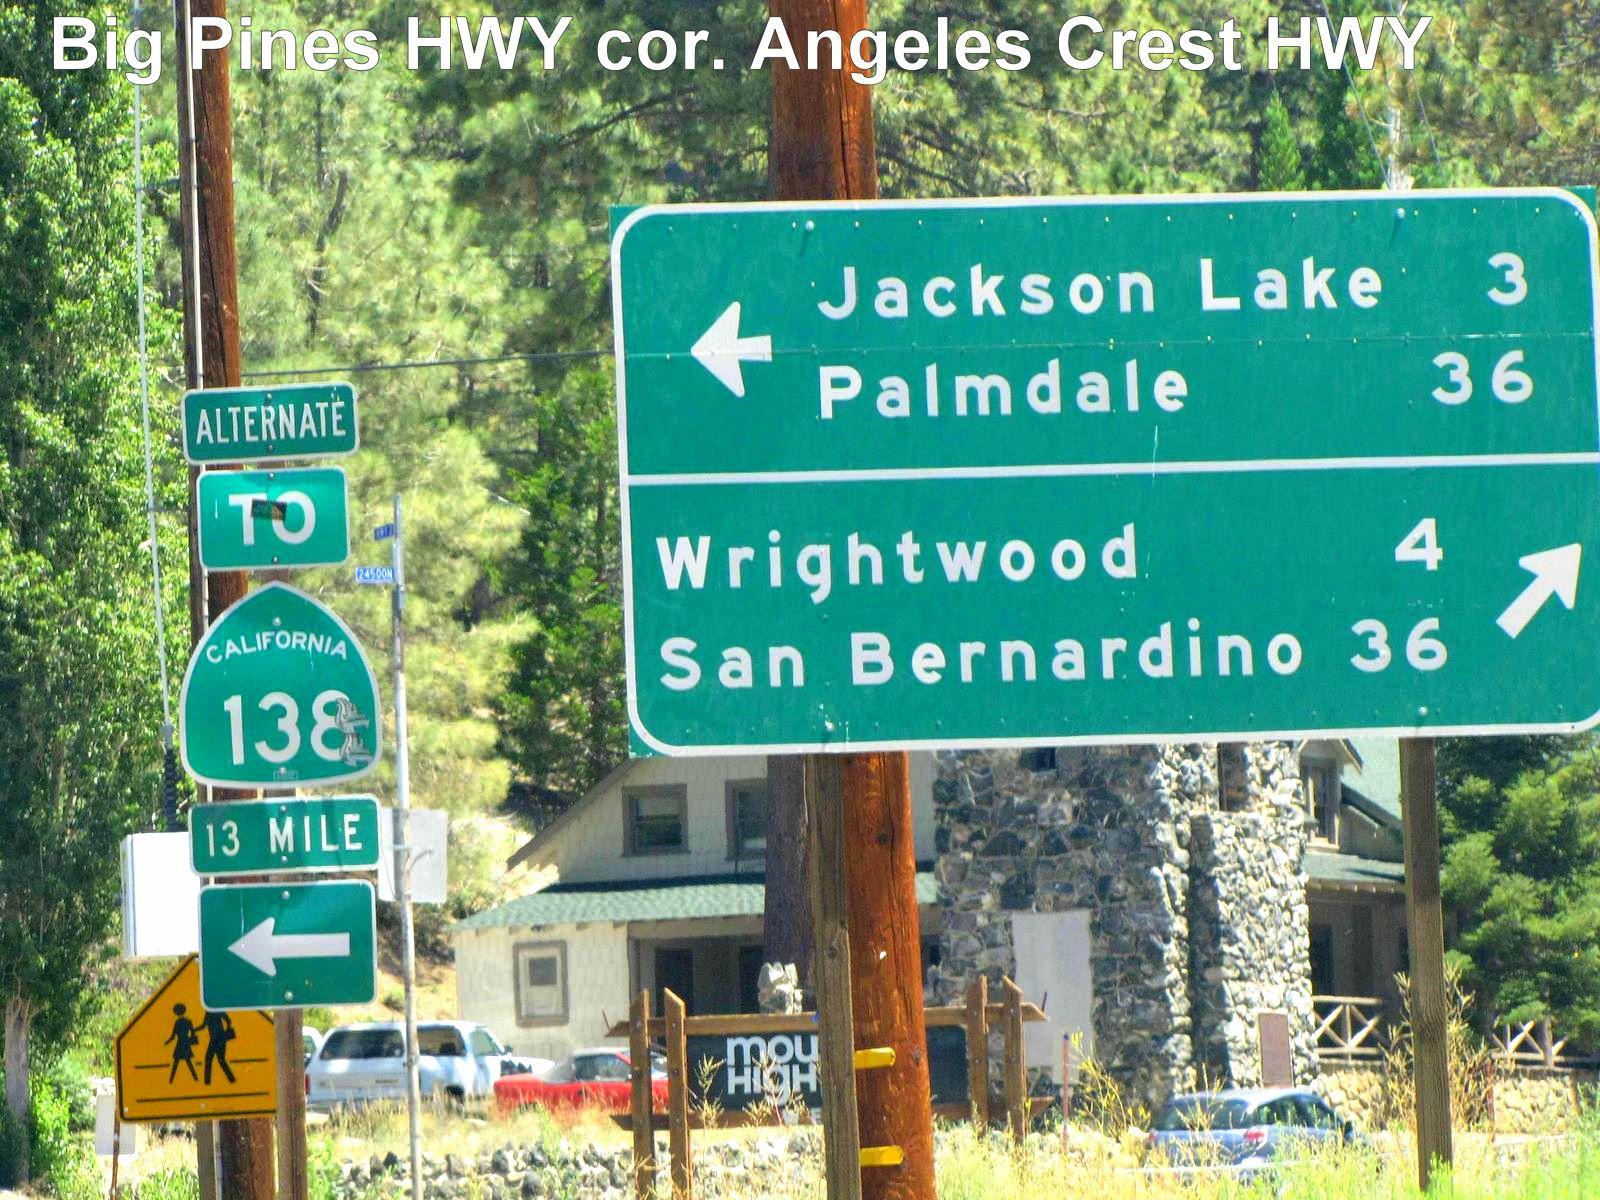 [Palmdale_08_AngelesCrest-1.jpg]